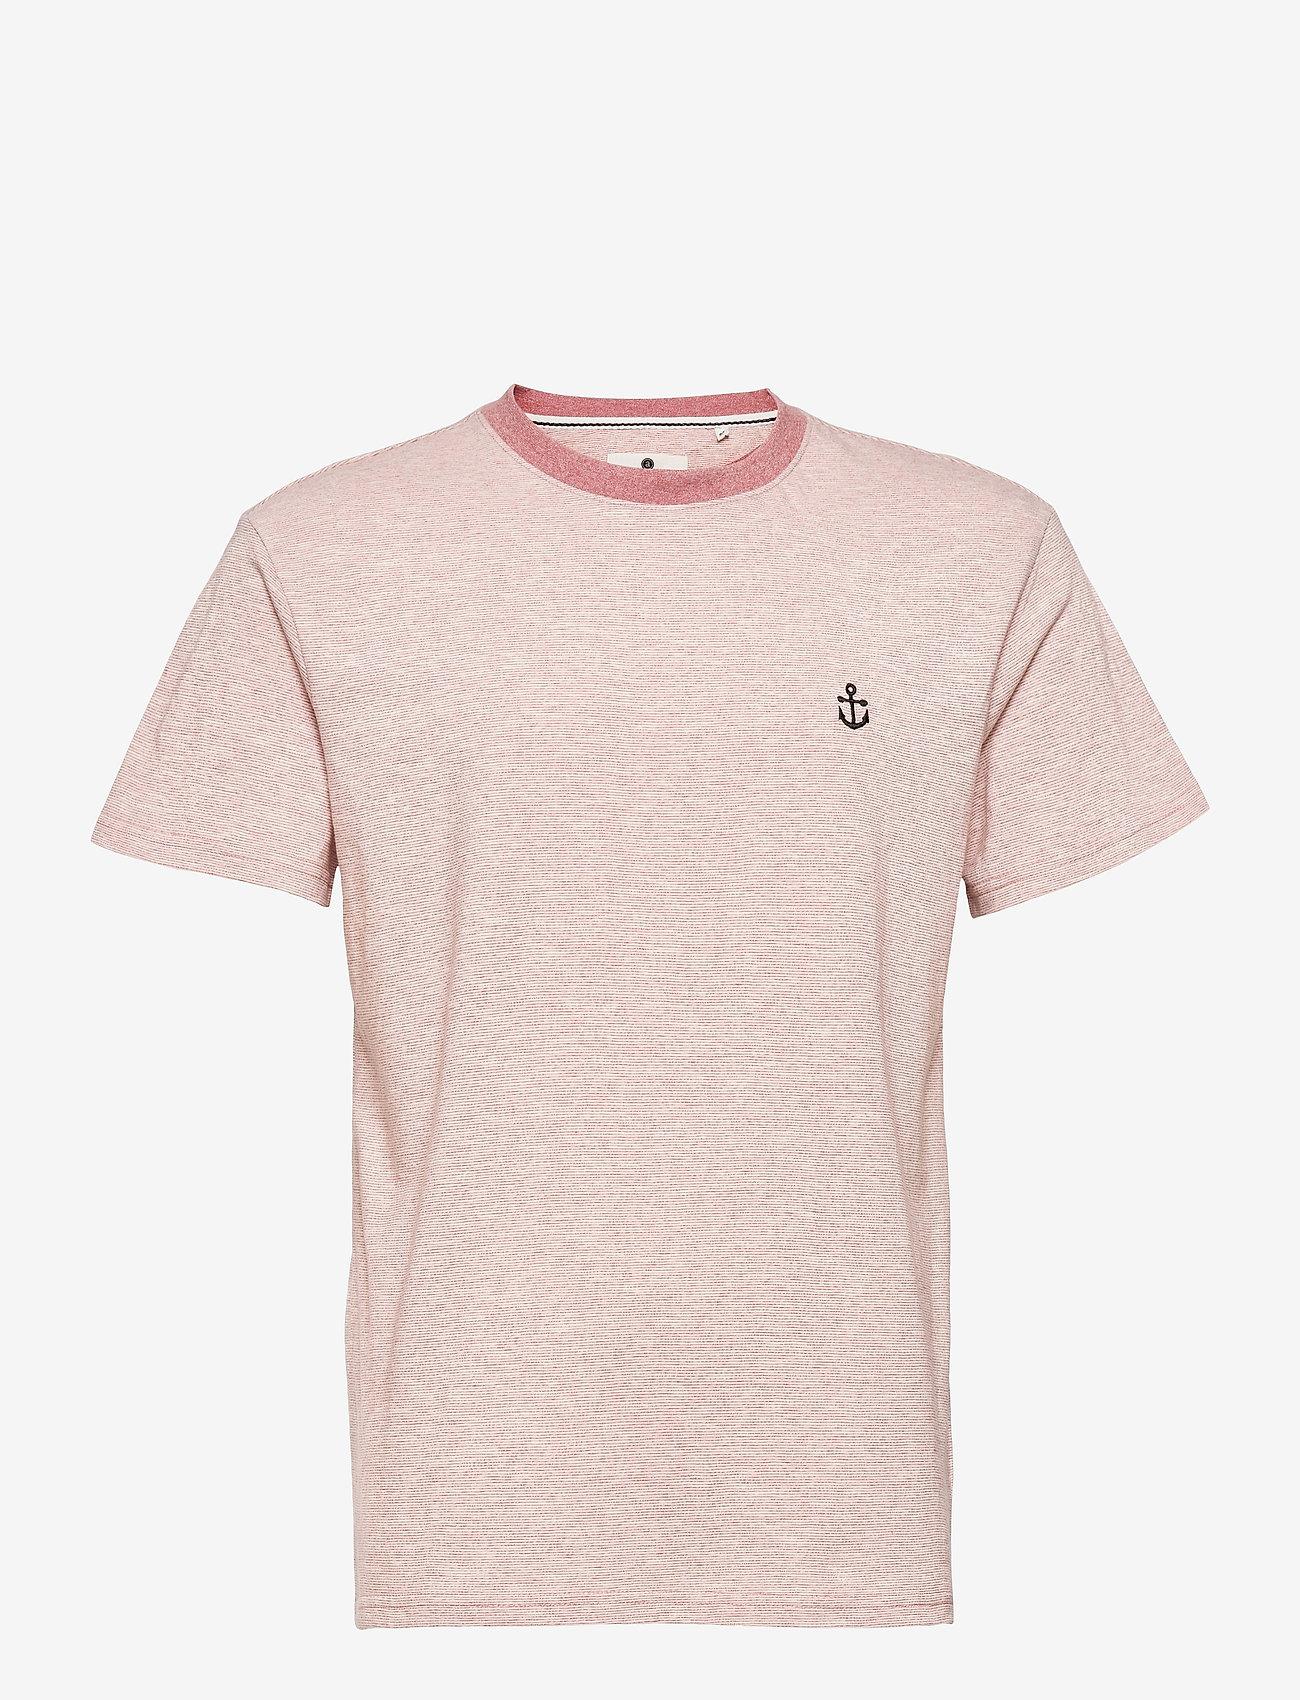 Anerkjendt - AKKIKKI CURV EMB - t-shirts - old rose - 1